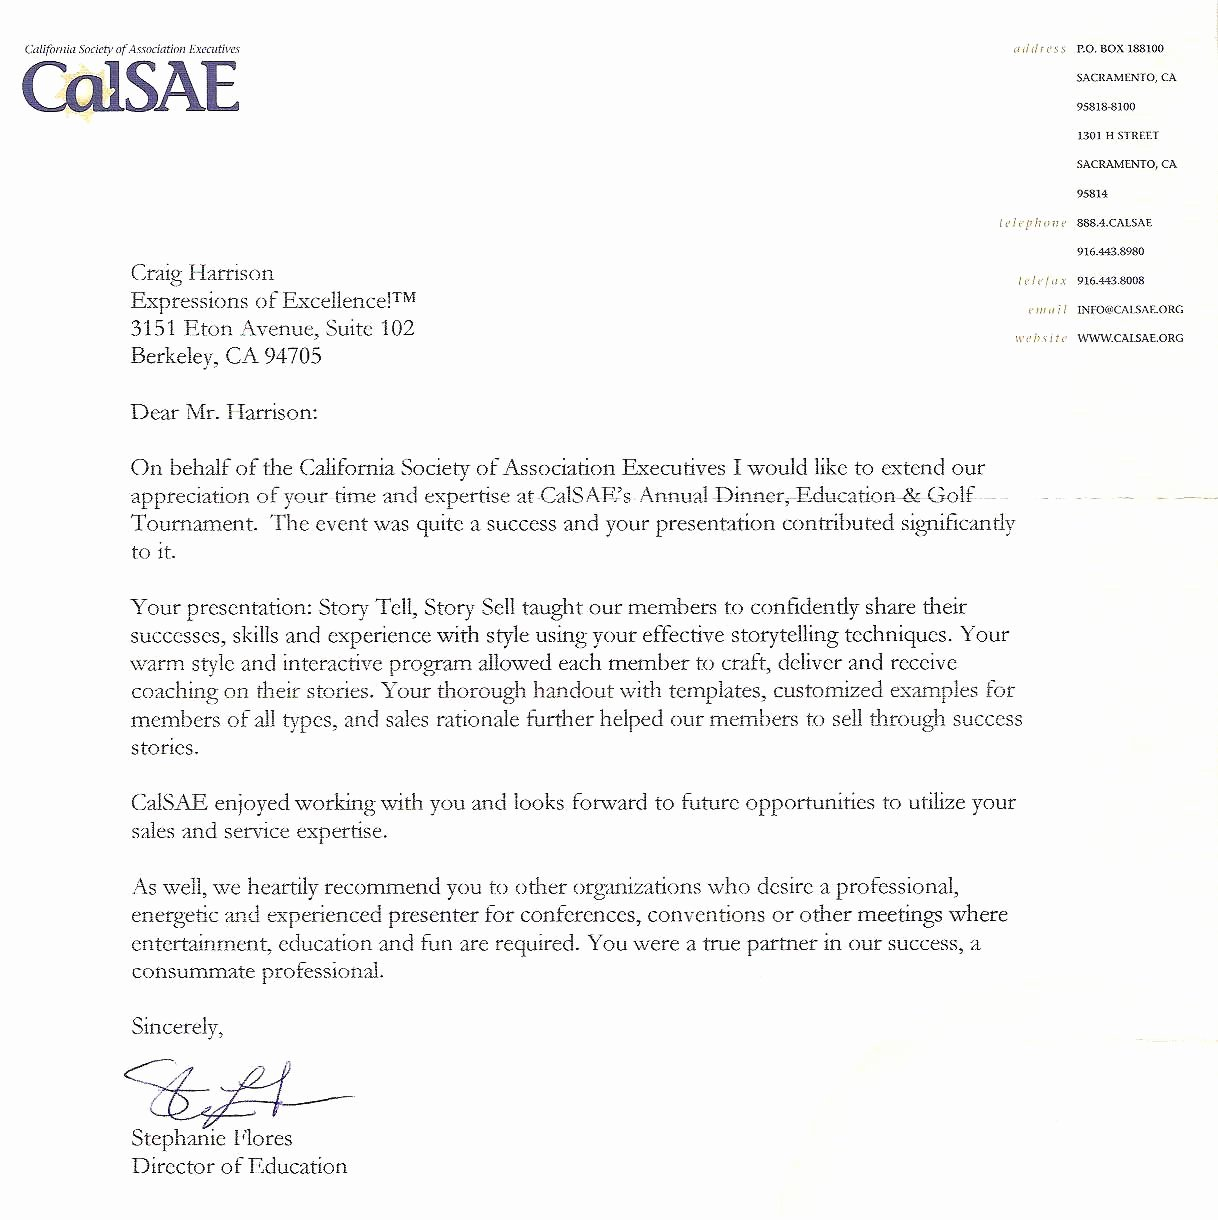 Customer Service Recommendation Letter Elegant Sample Student Council Letters Of Re Mendation for